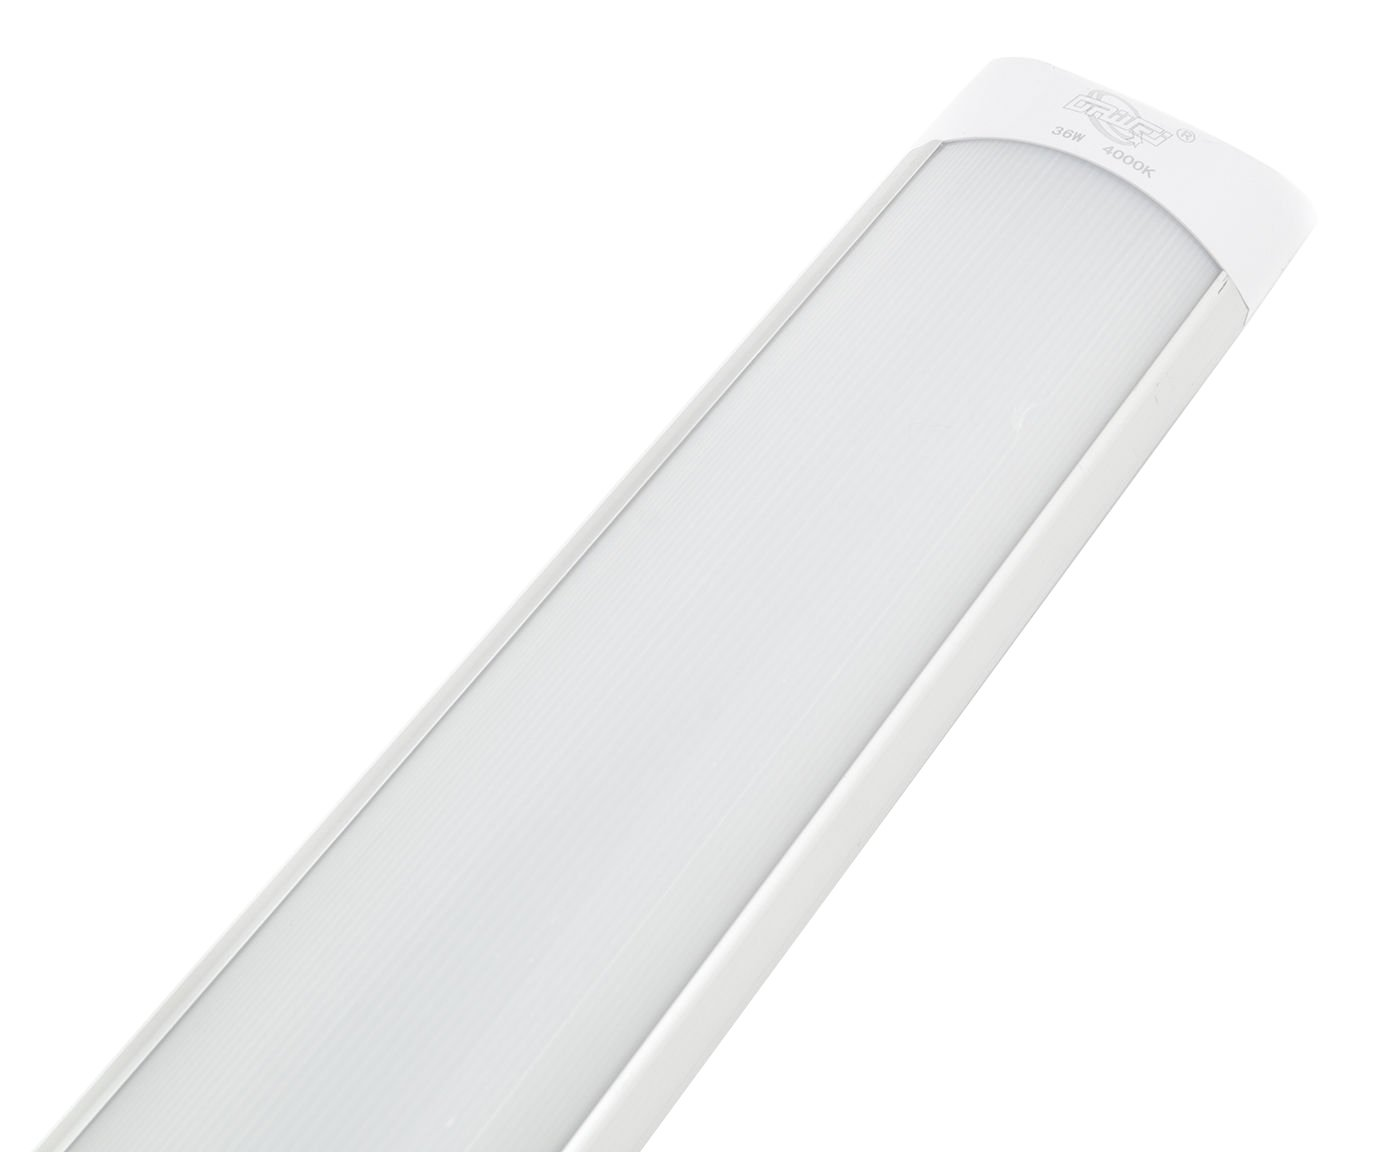 Plafoniere Led Per Scale Condominiali : Plafoniera led w watt luce fredda cm slim smd soffitto v